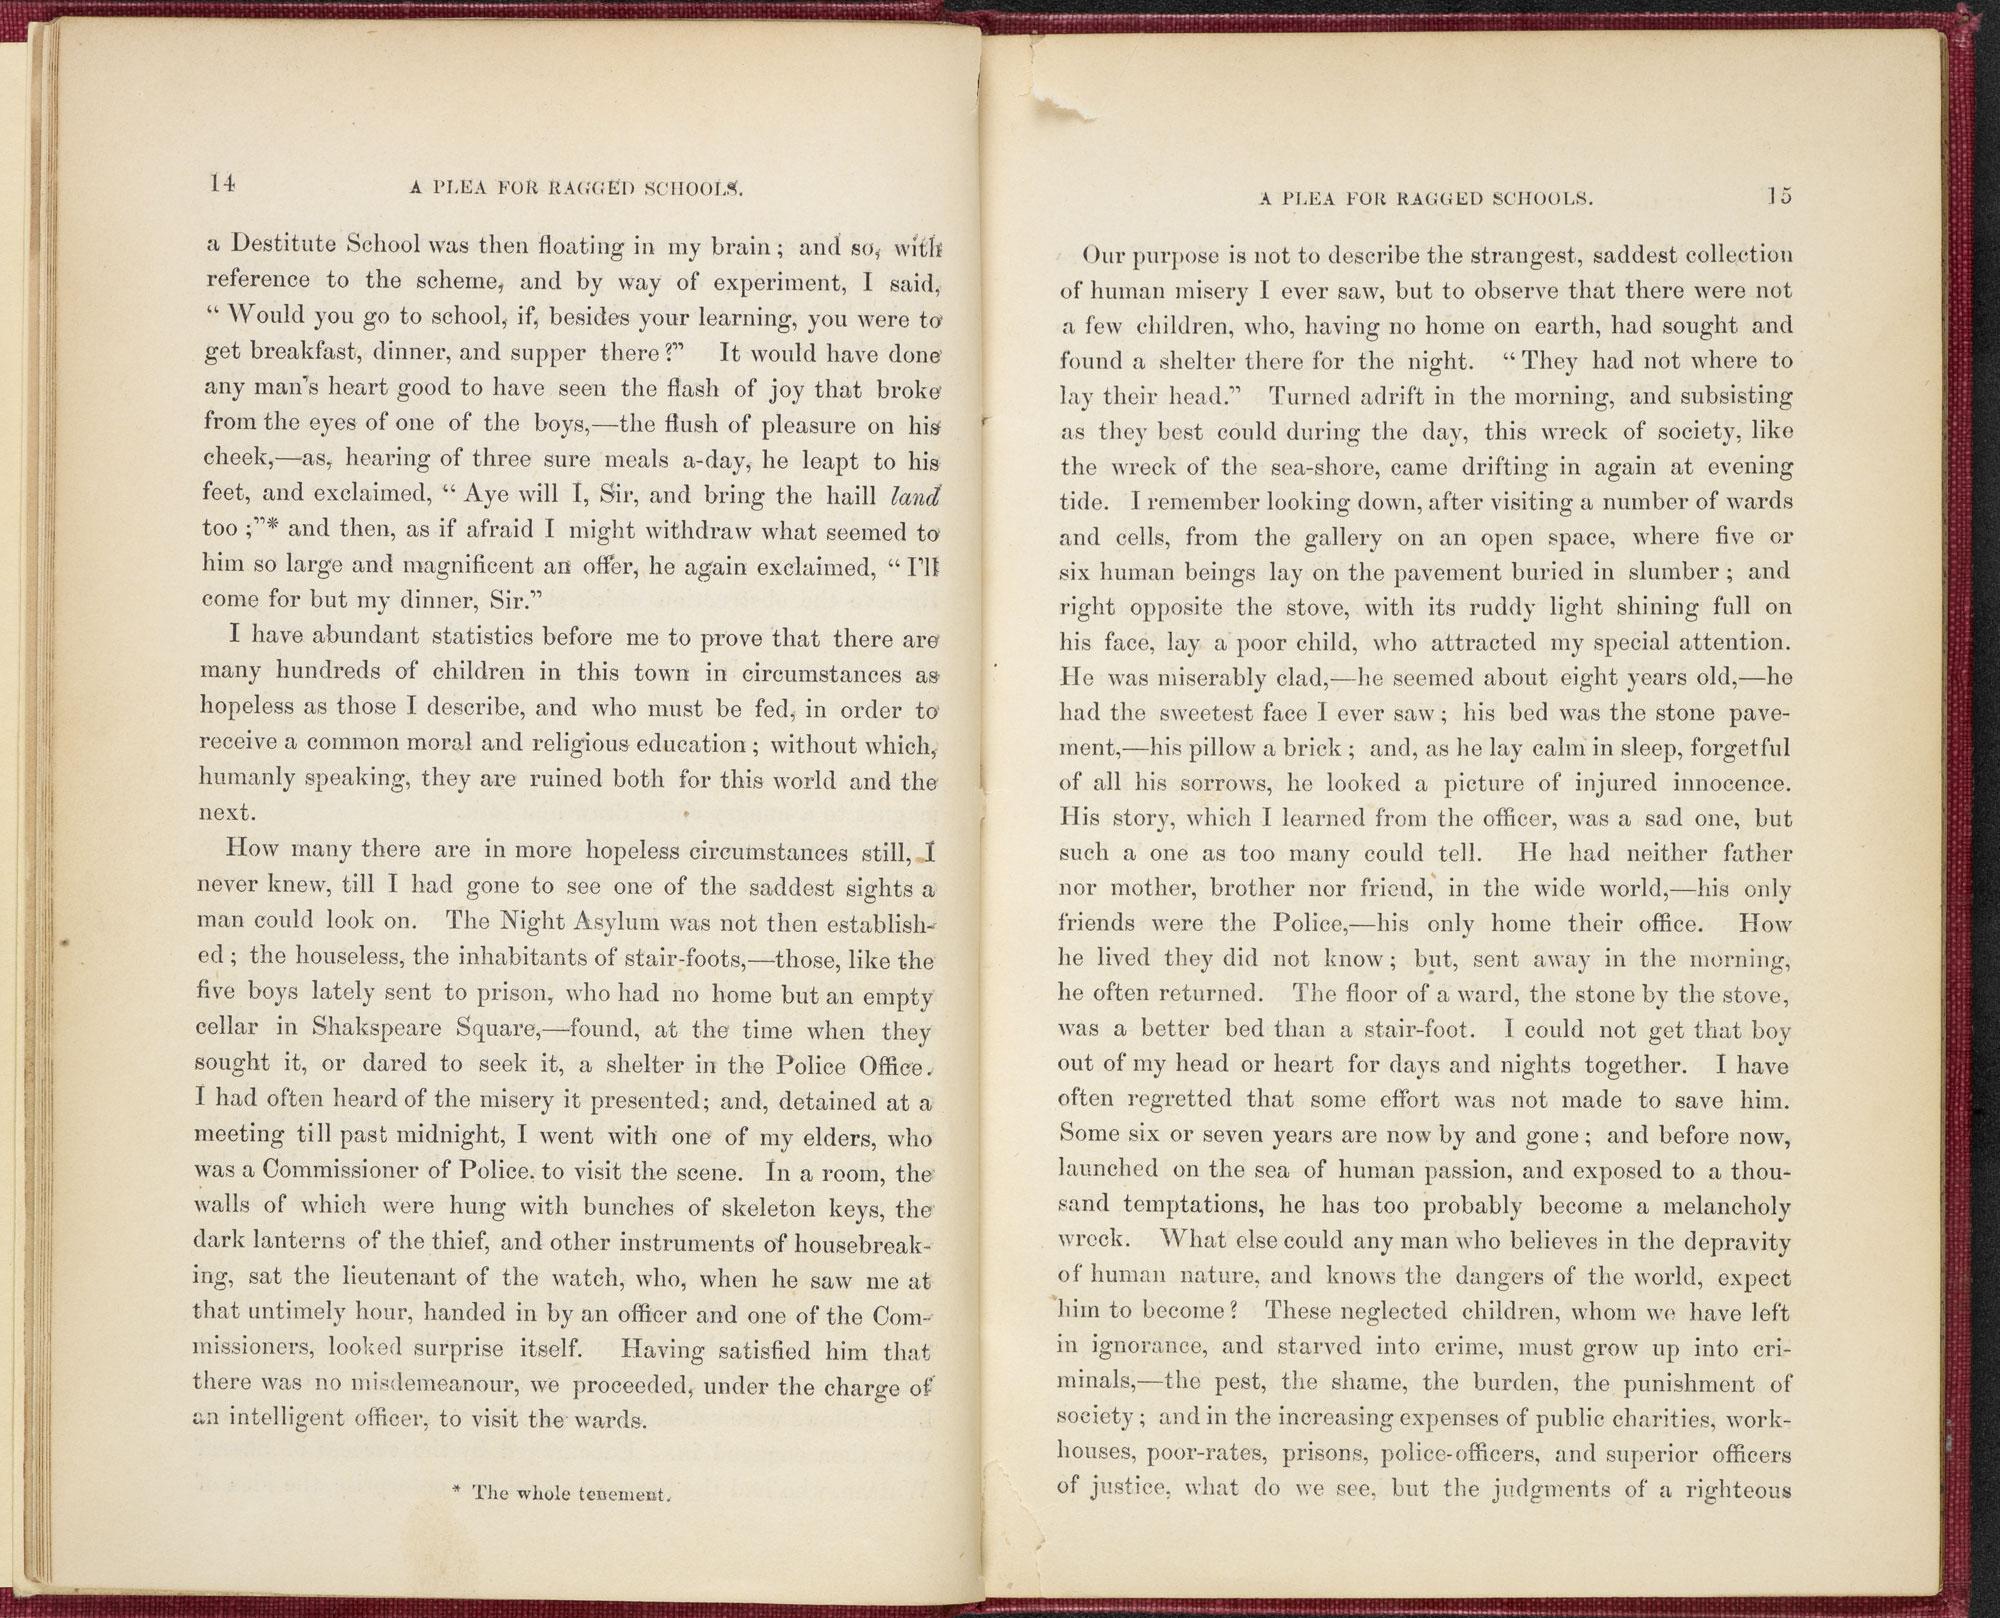 A plea for Ragged Schools [page: 14-15]